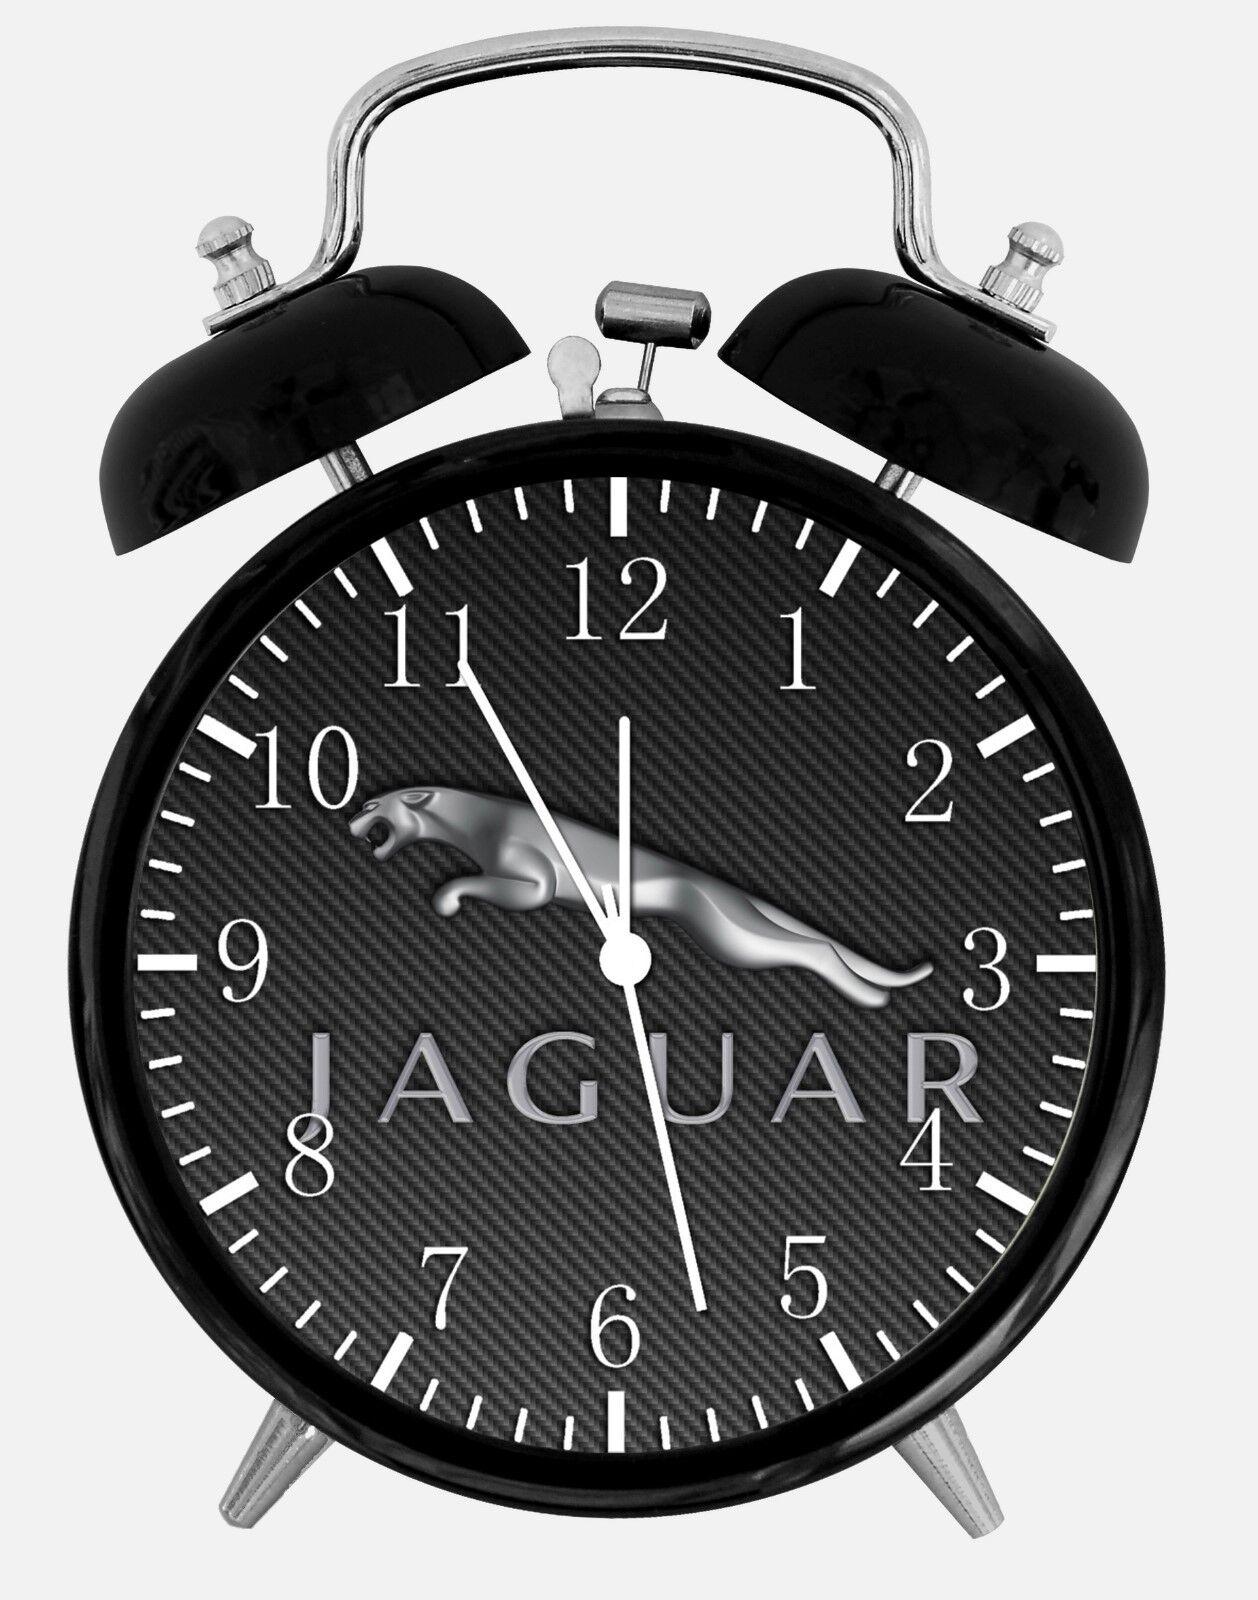 "Jagura Alarm Desk Clock 3.75"" Home or Office Decor W453 Nice For Gift"